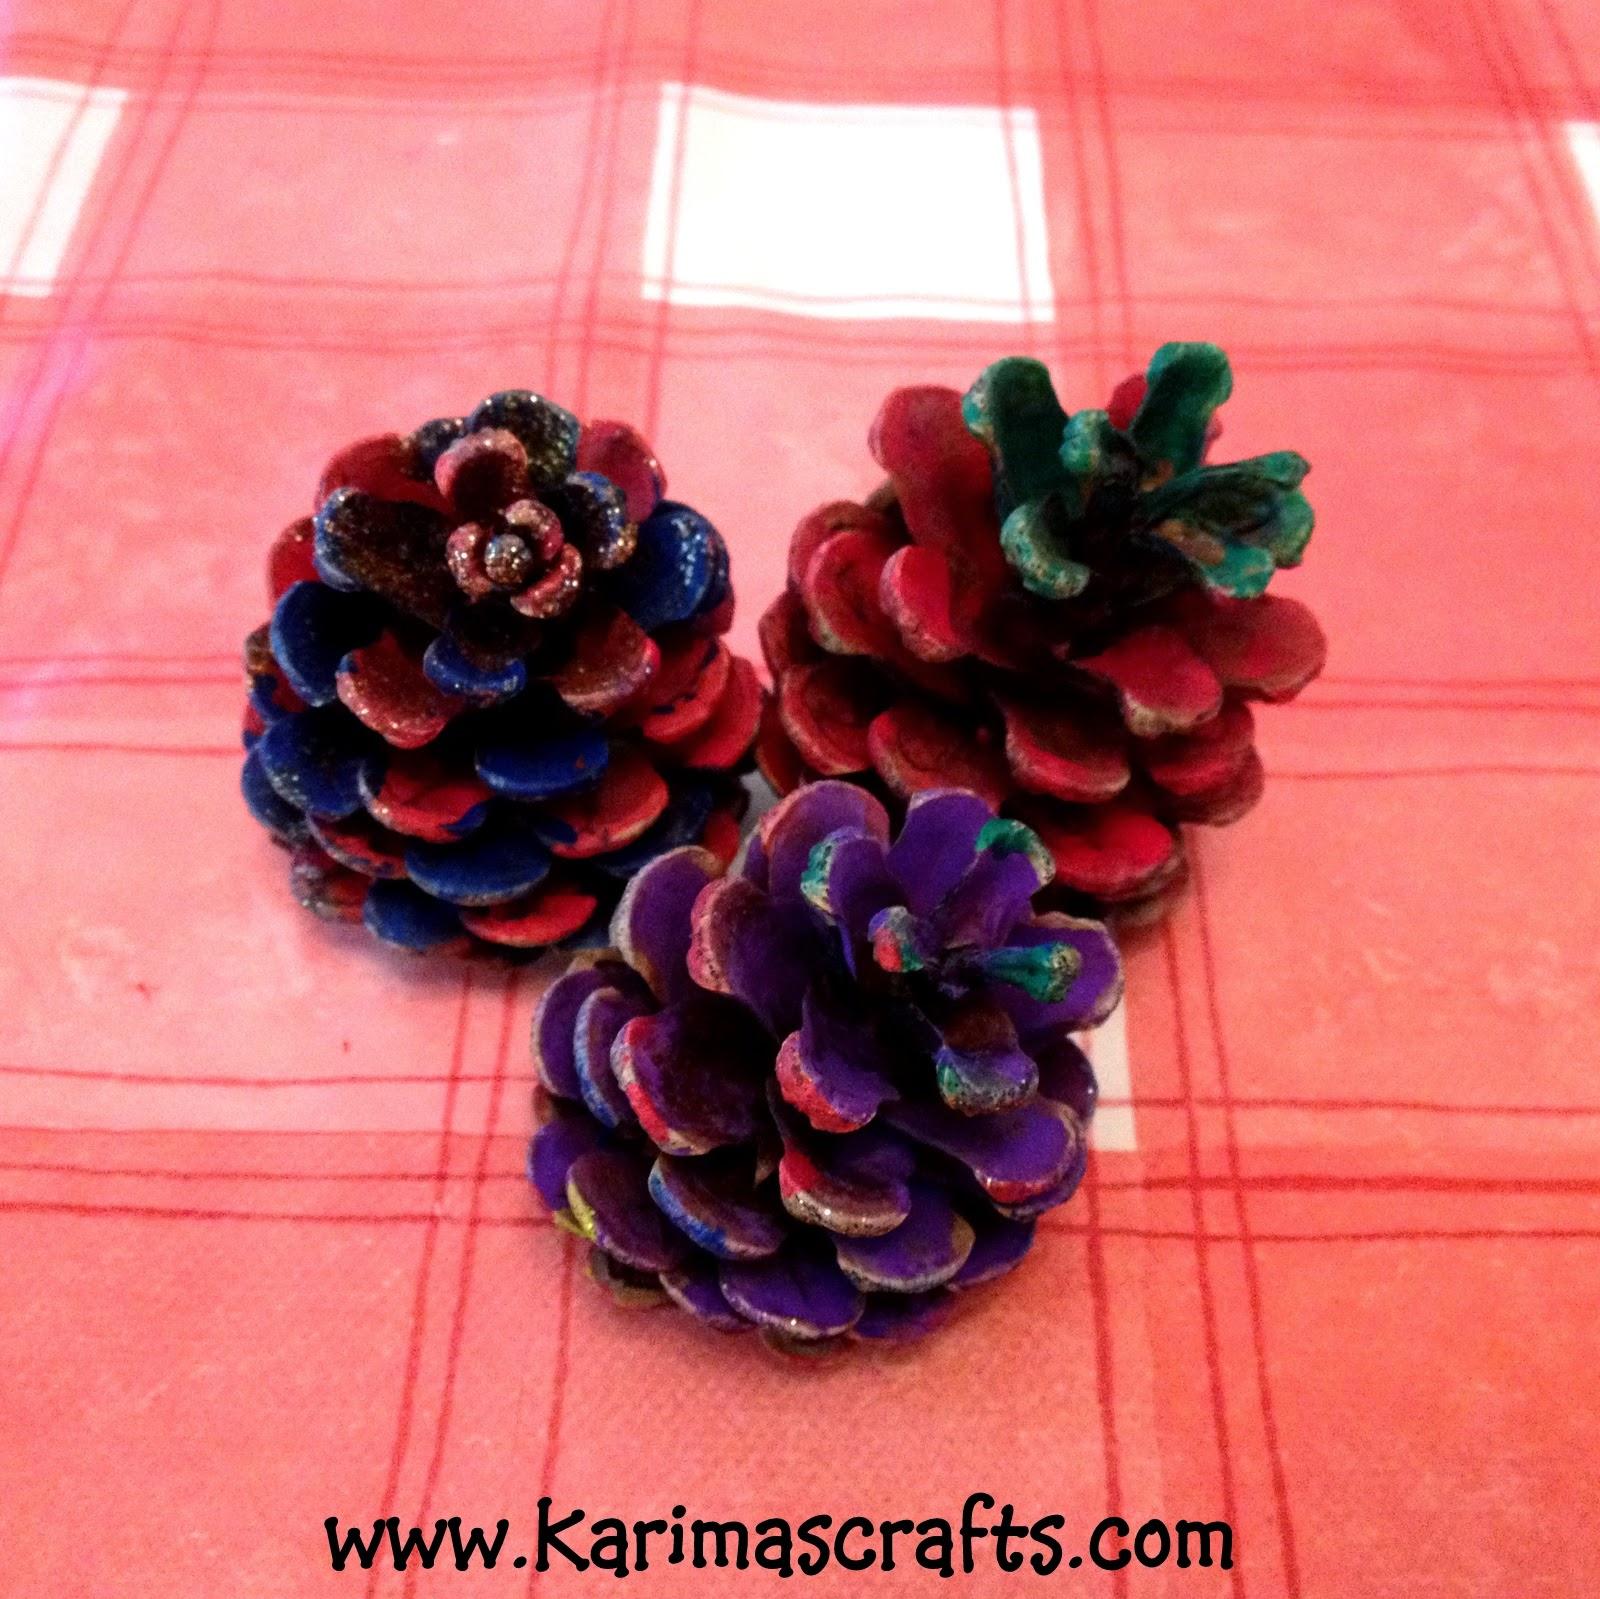 Karima's Crafts: Painted Pine Cones Crafts